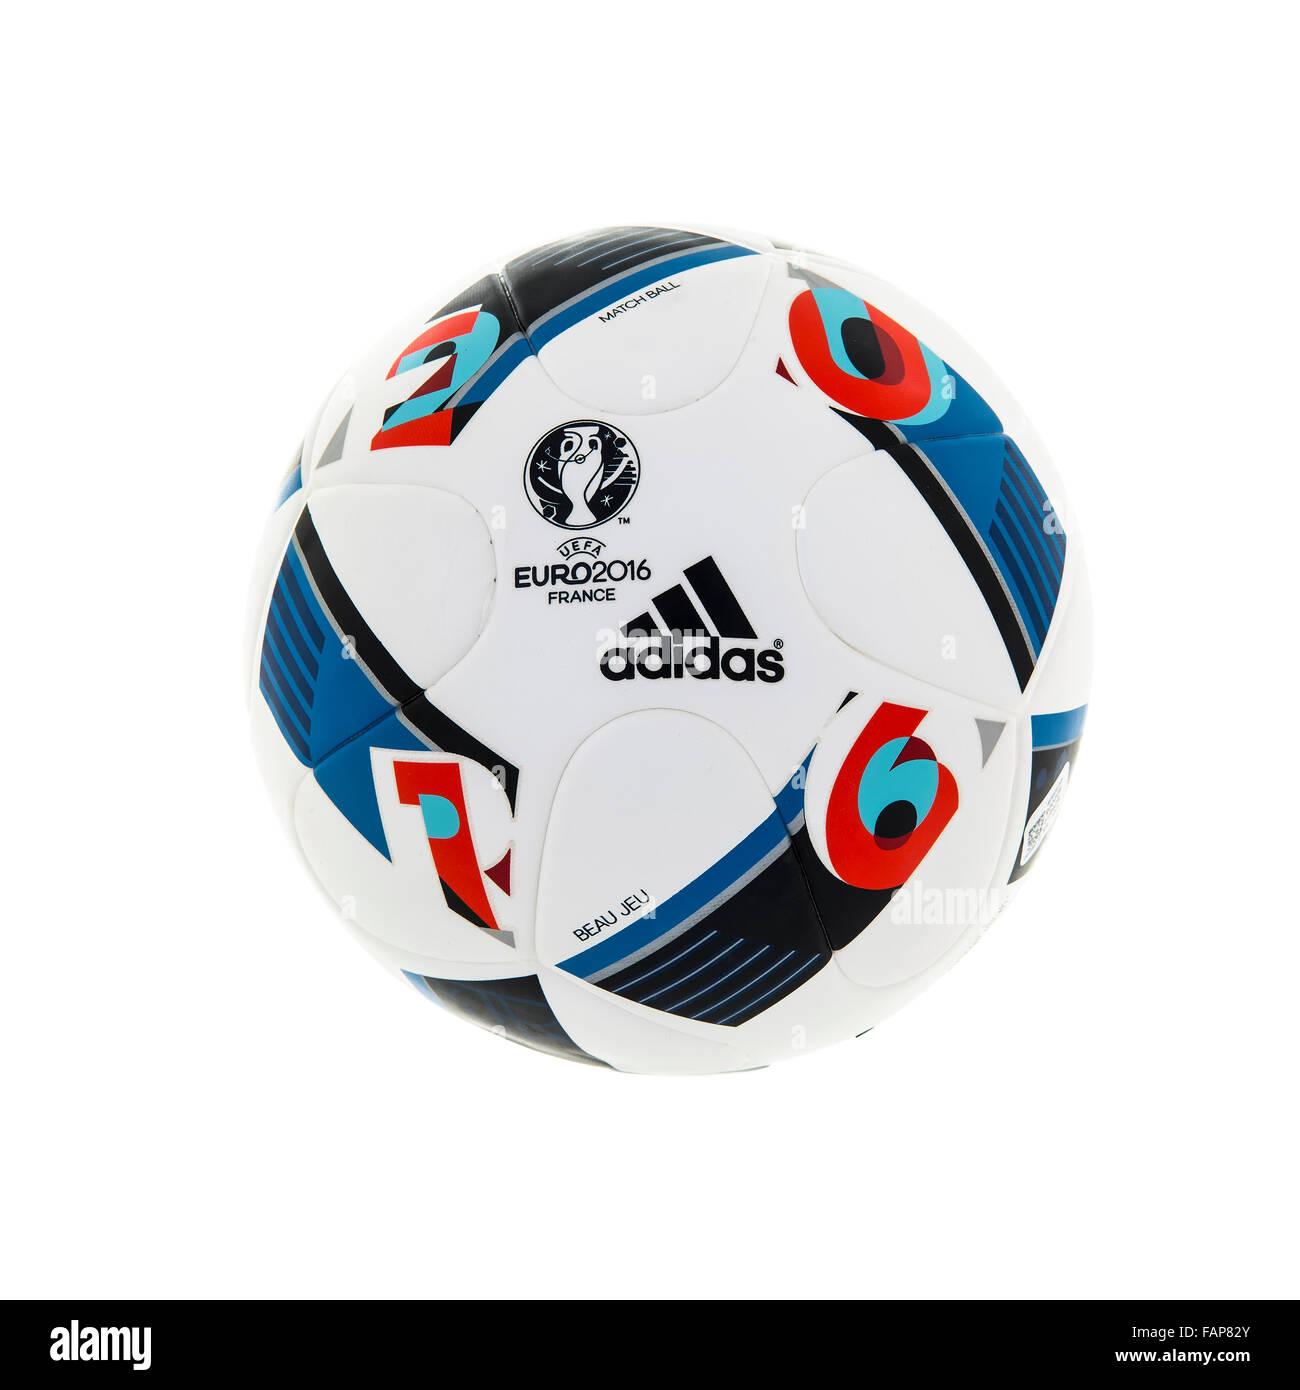 Adidas BEAU JEU balón oficial para la UEFA EURO 2016 6624150fe26e5